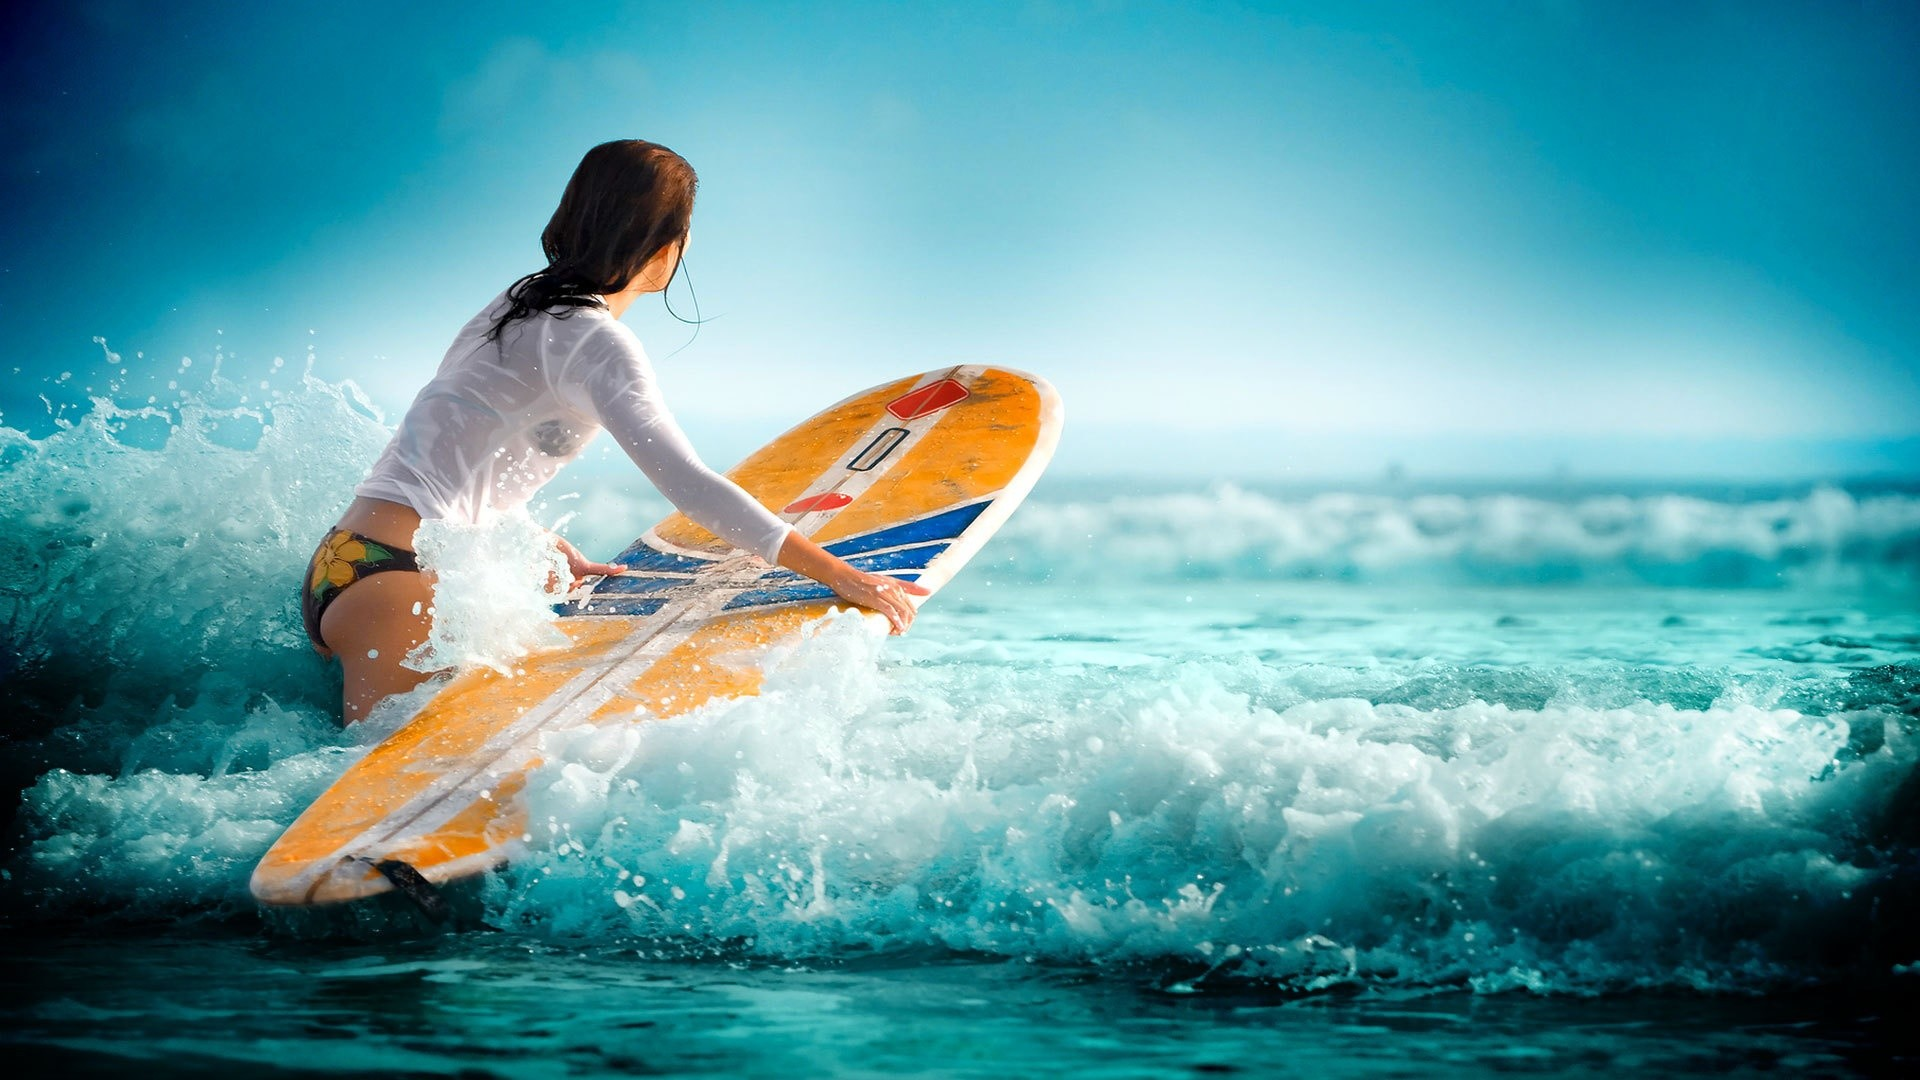 Surfing – Wallpaper, High Definition, High Quality, Widescreen